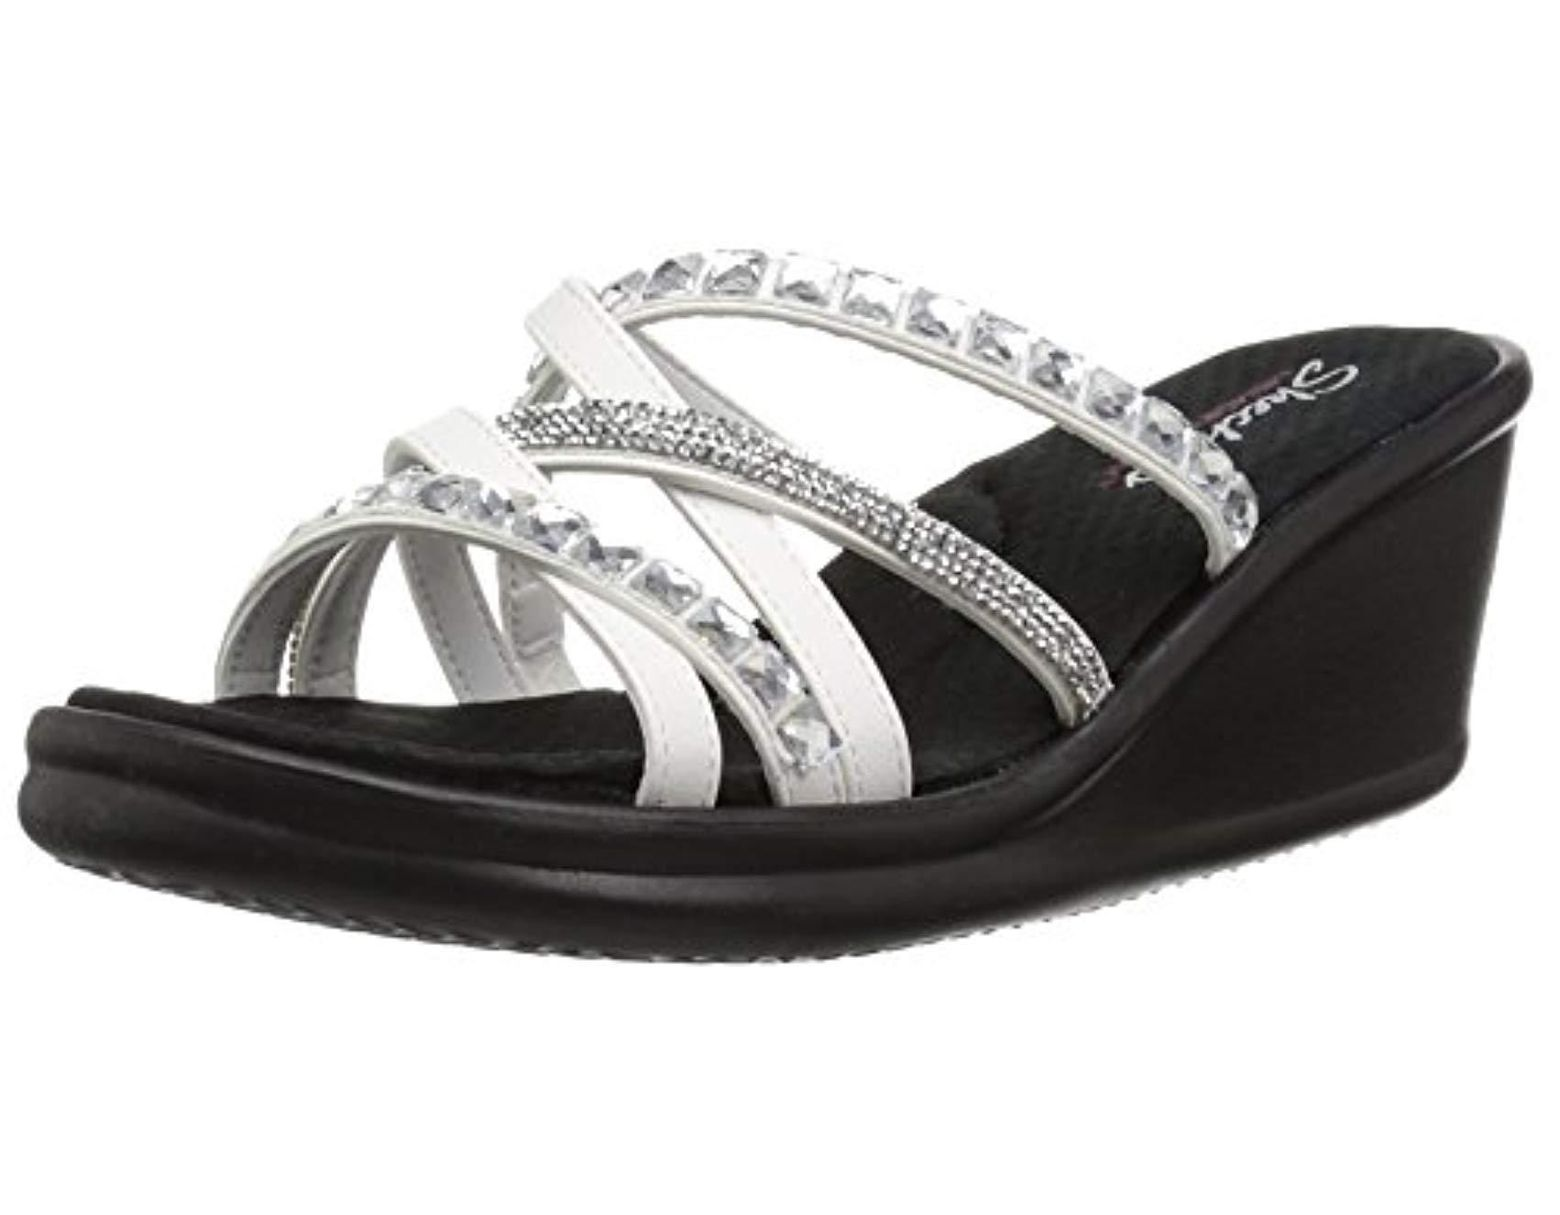 118a32f6a71a Skechers. Women s White Rumblers-glass Flowers-rhinestone Multi-strap Slide  ...